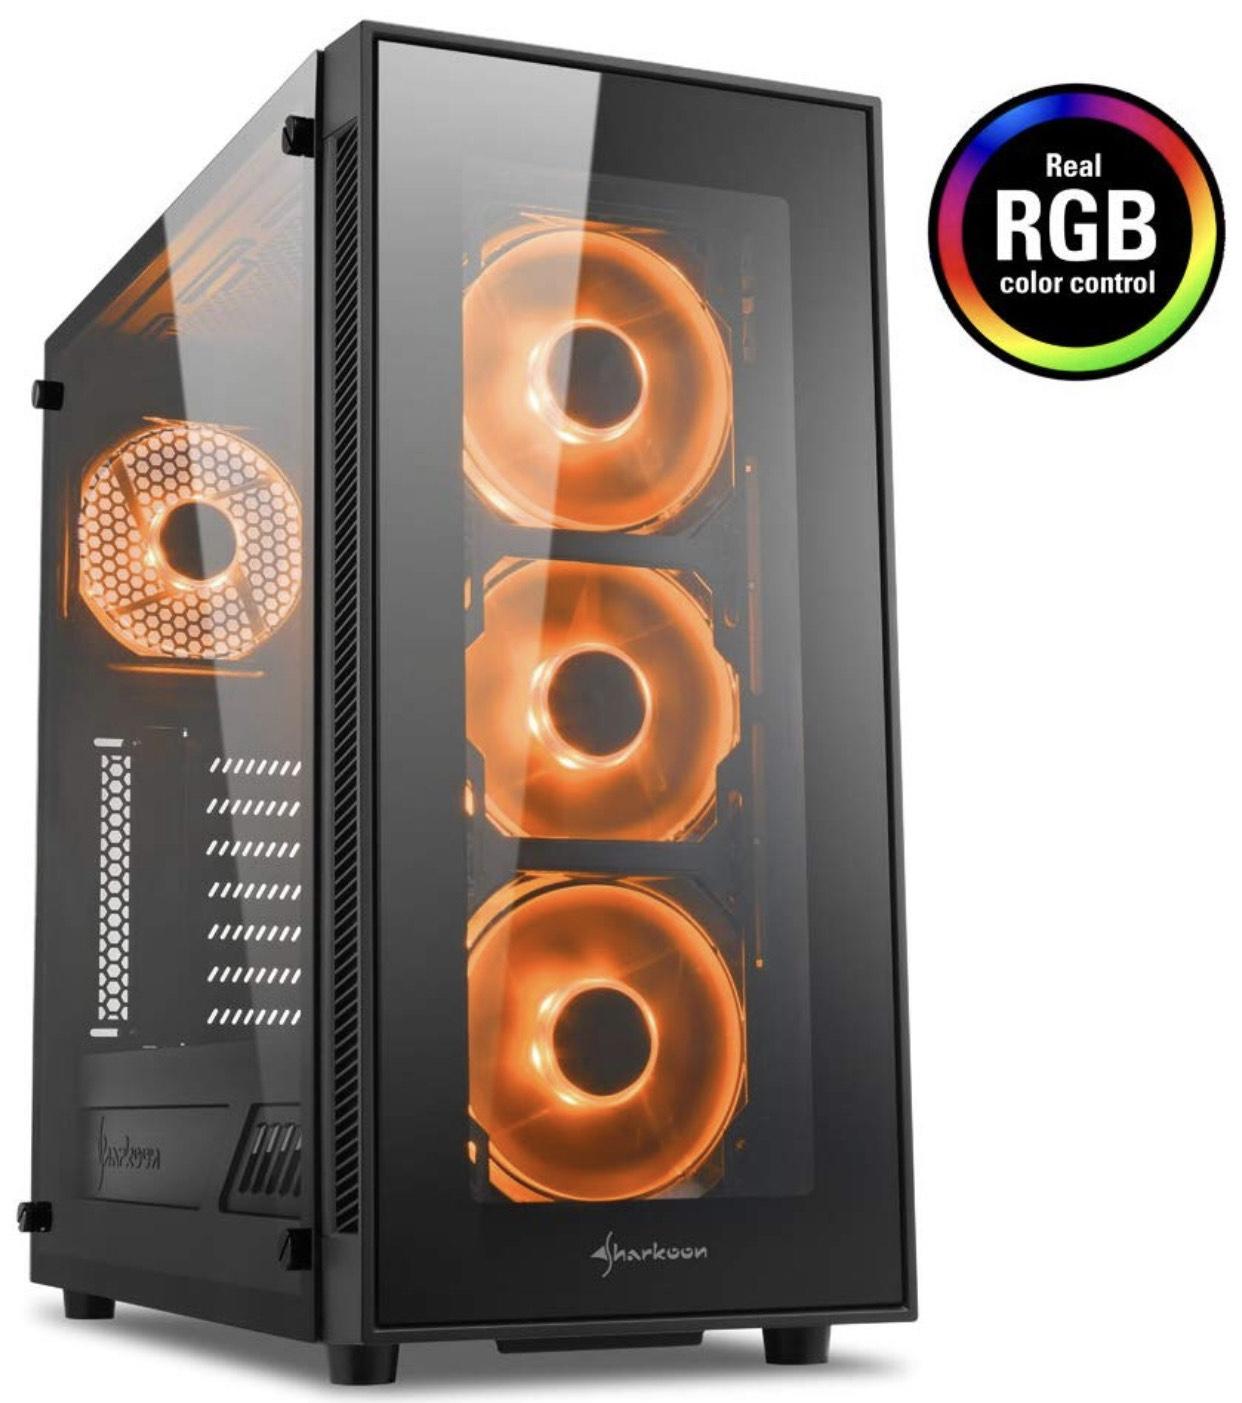 Sharkoon TG5 RGB PC Gehäuse Gaming mit RGB bei Alternate | 44,90€ mit paydirekt